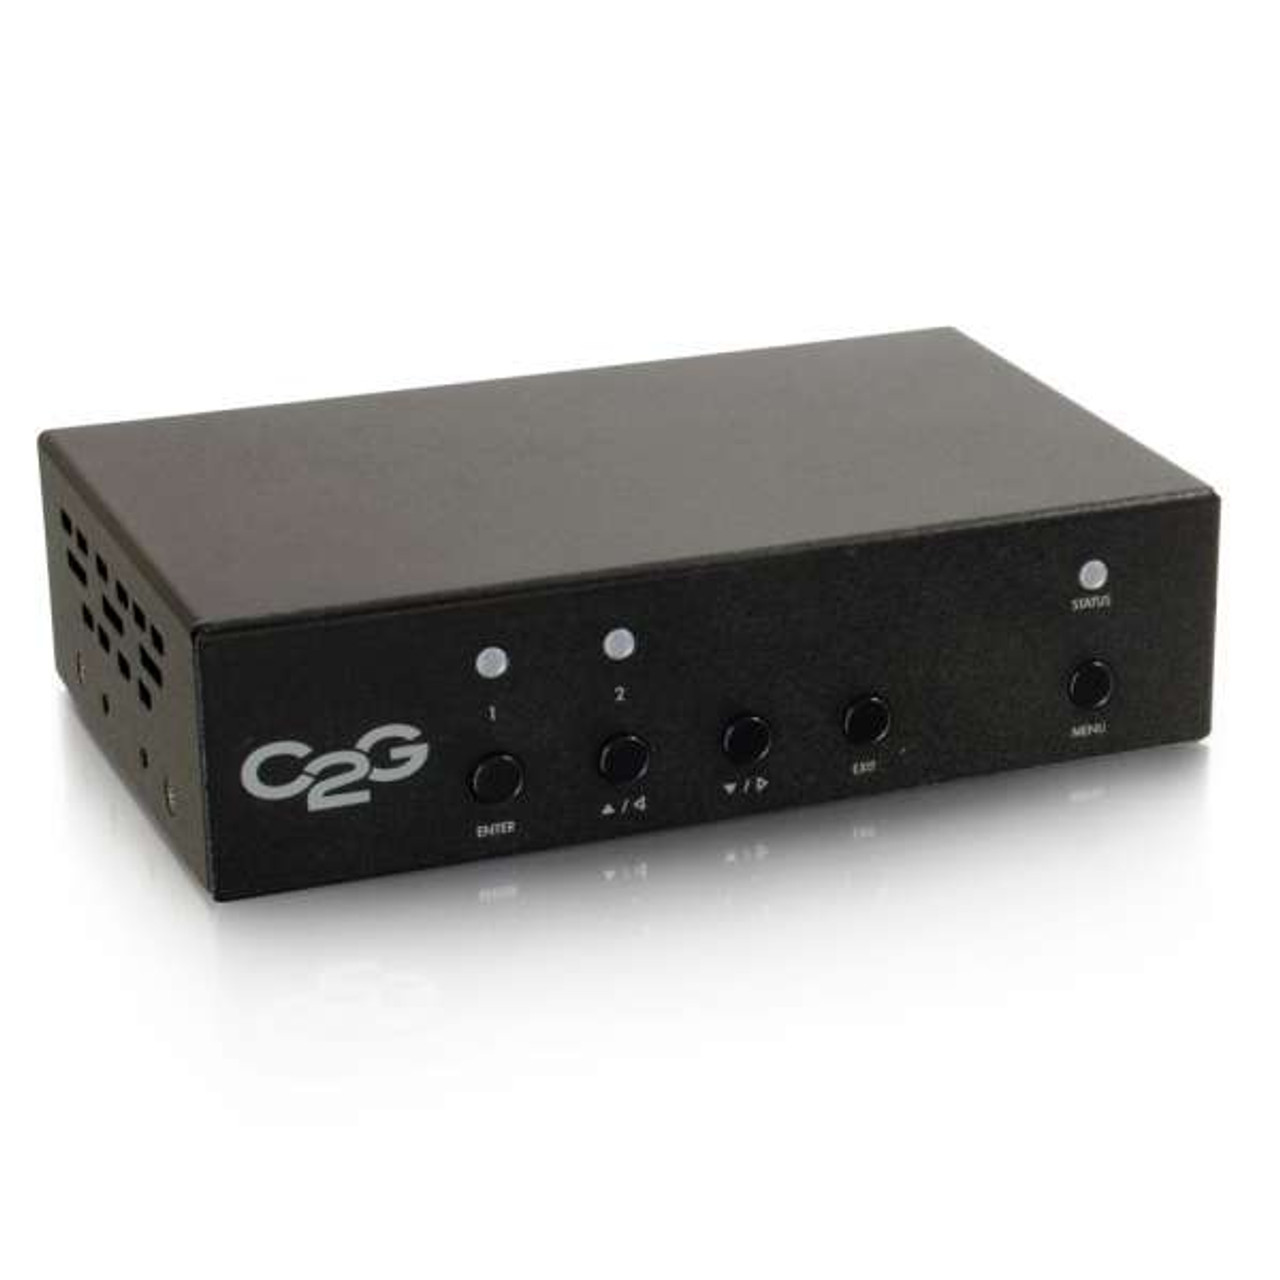 HDBaseT Over Cat5 Extender Receiver - Scaler/De-embedder (29372)